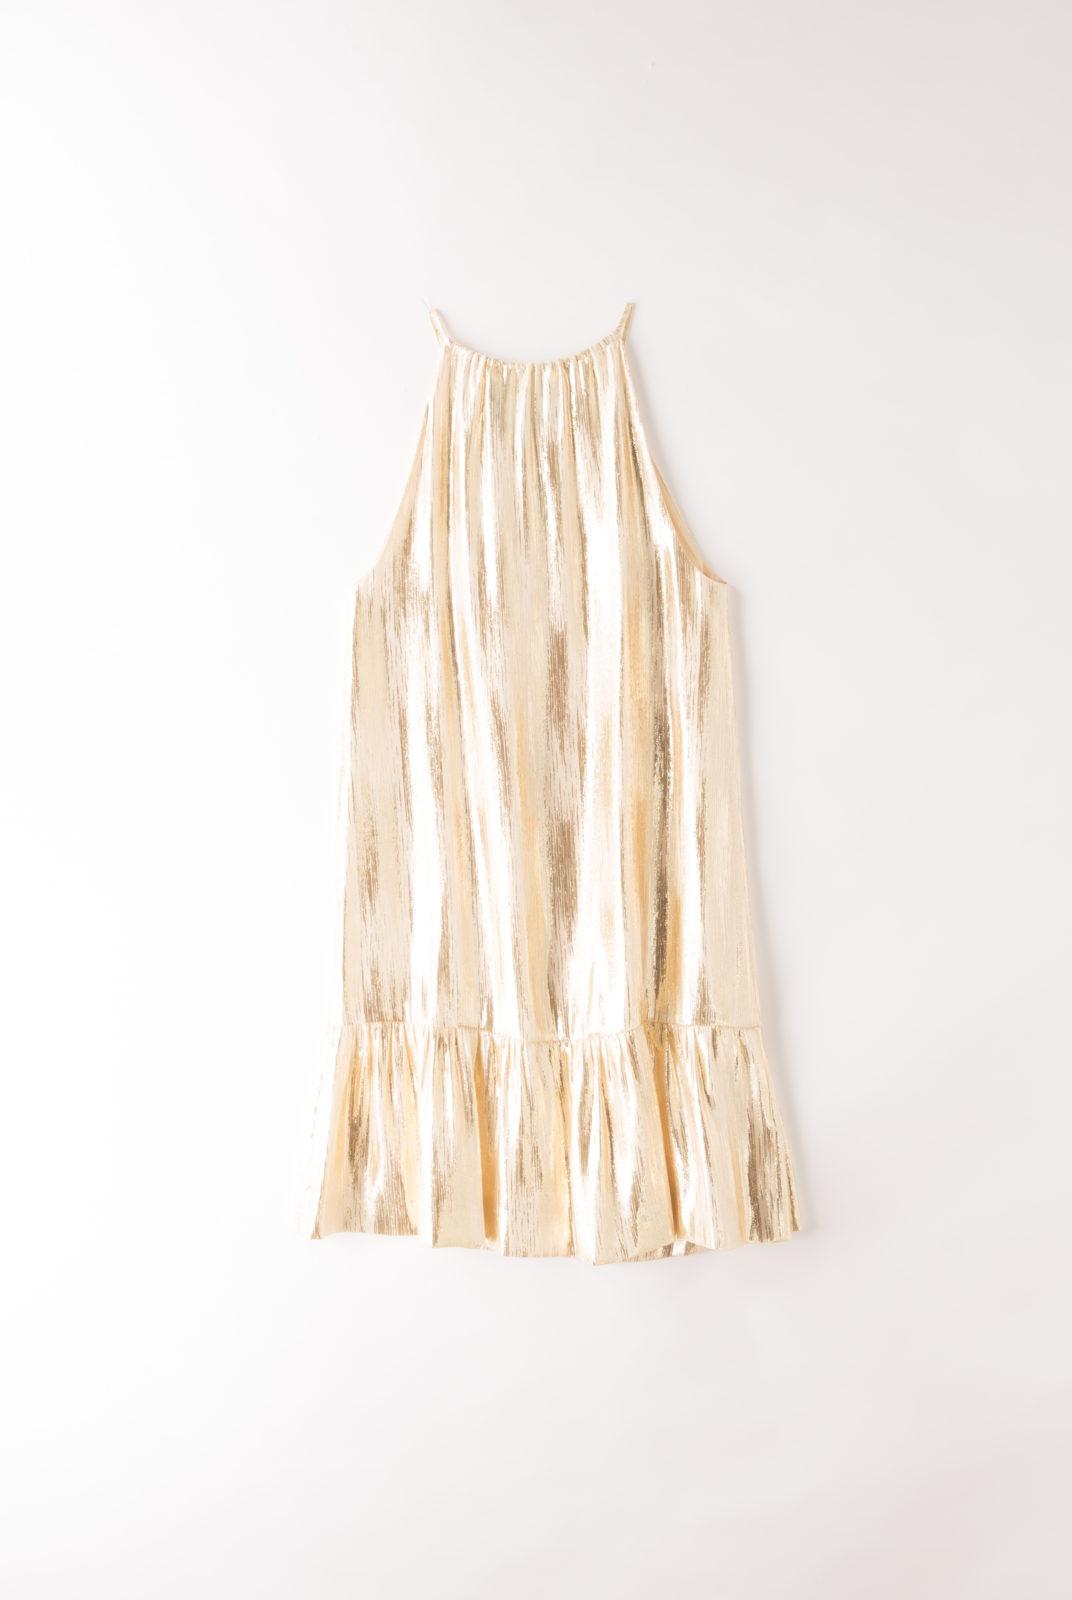 Robe flamme or lamée, robe trapèze à bretelle, vanessa seward